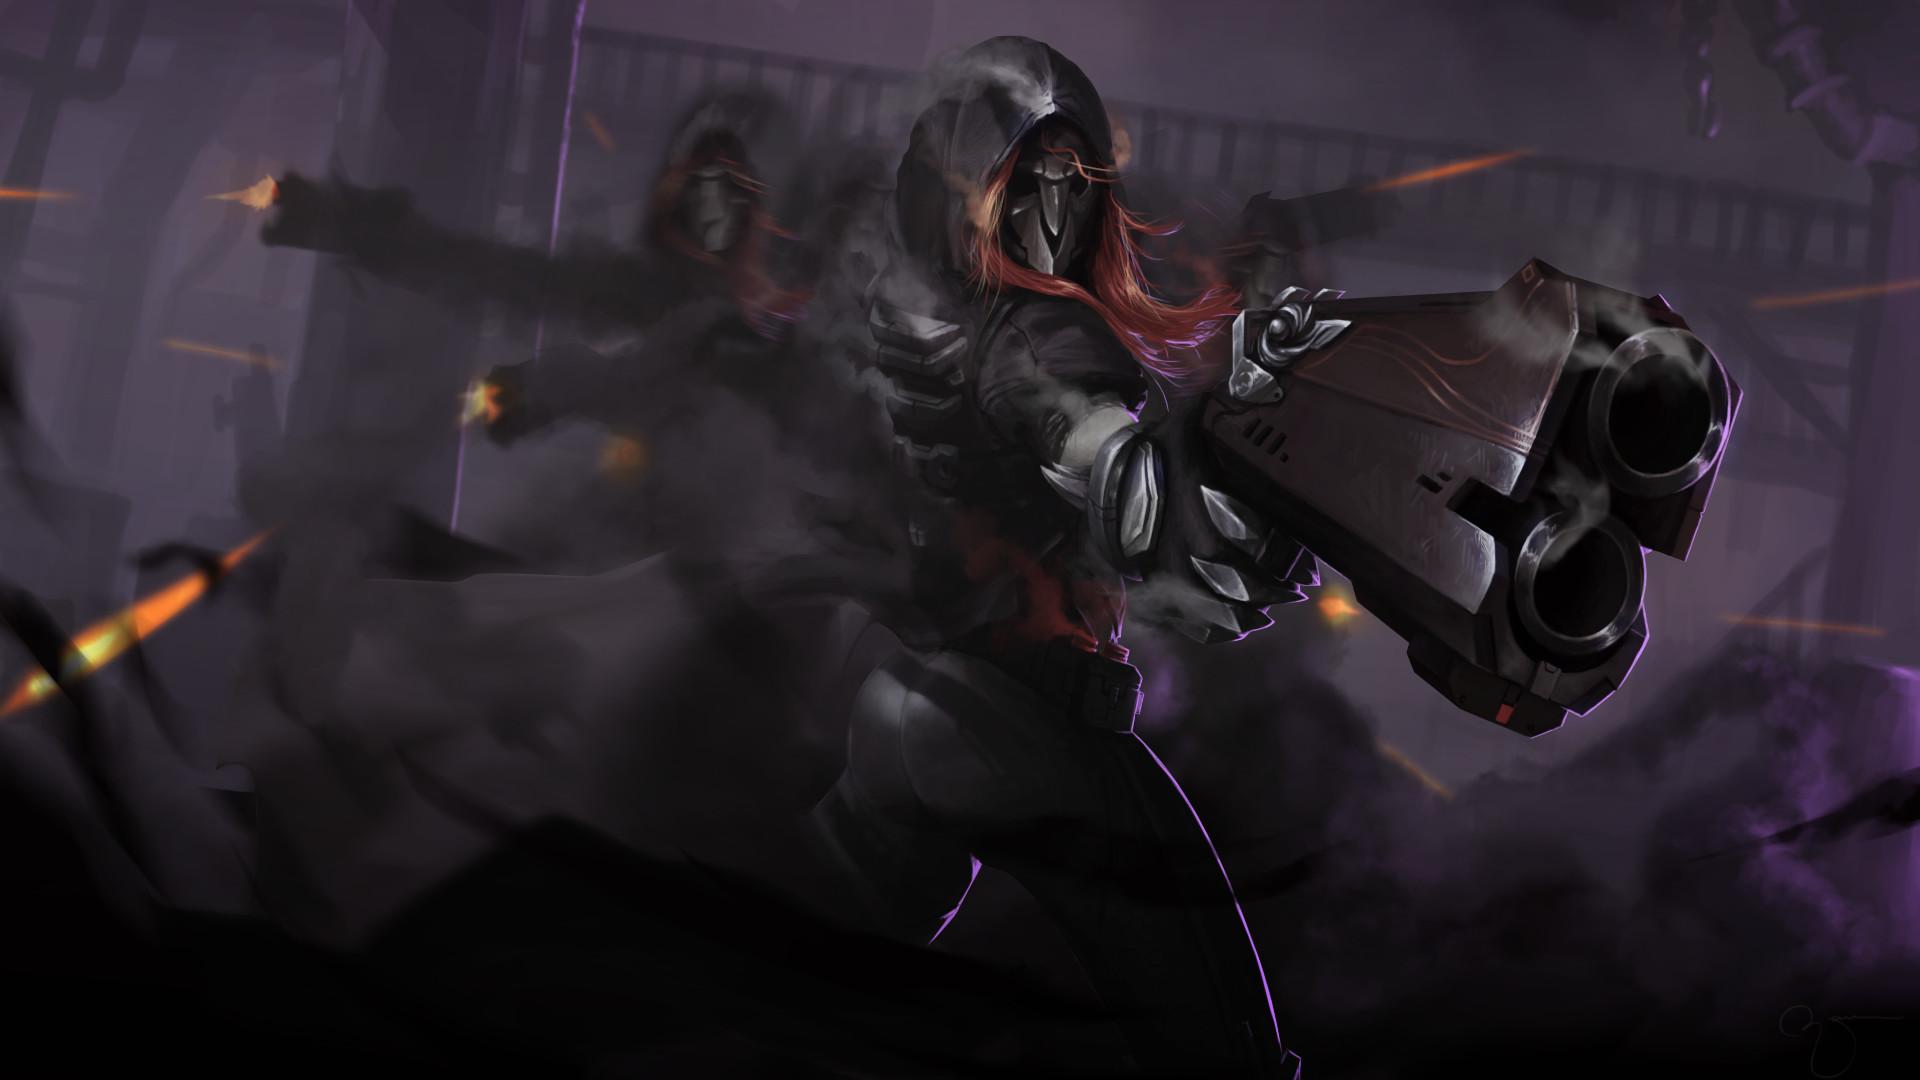 Reaper Overwatch Wallpaper Full Hd Wallpapersimagesorg